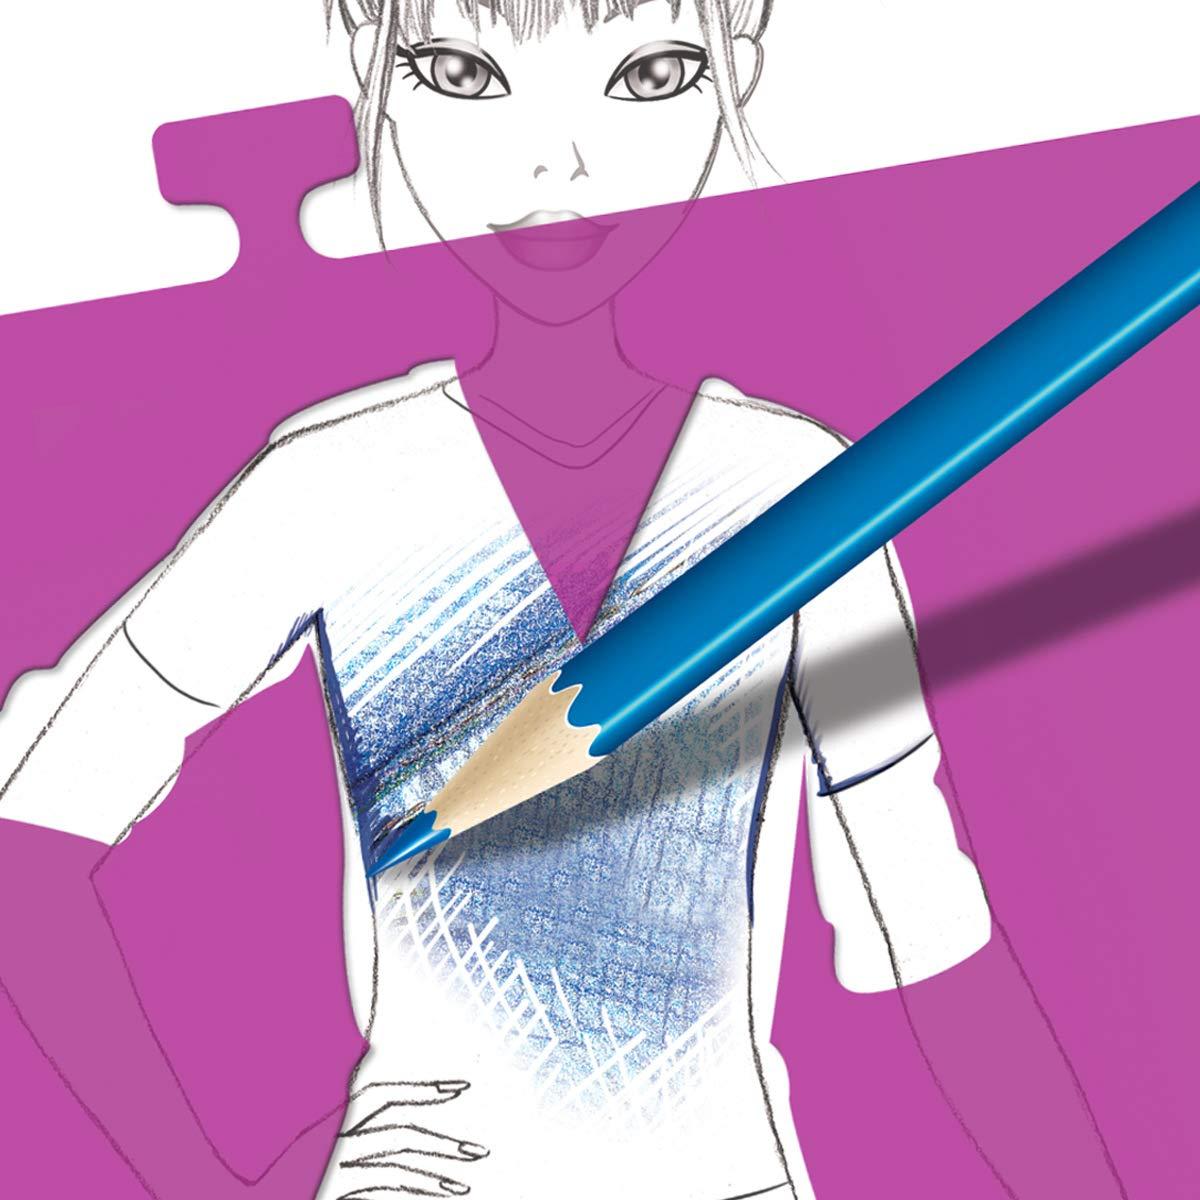 Denim Collection Sketchbook PURE /& CO LTD SMU-1466 Style Me Up